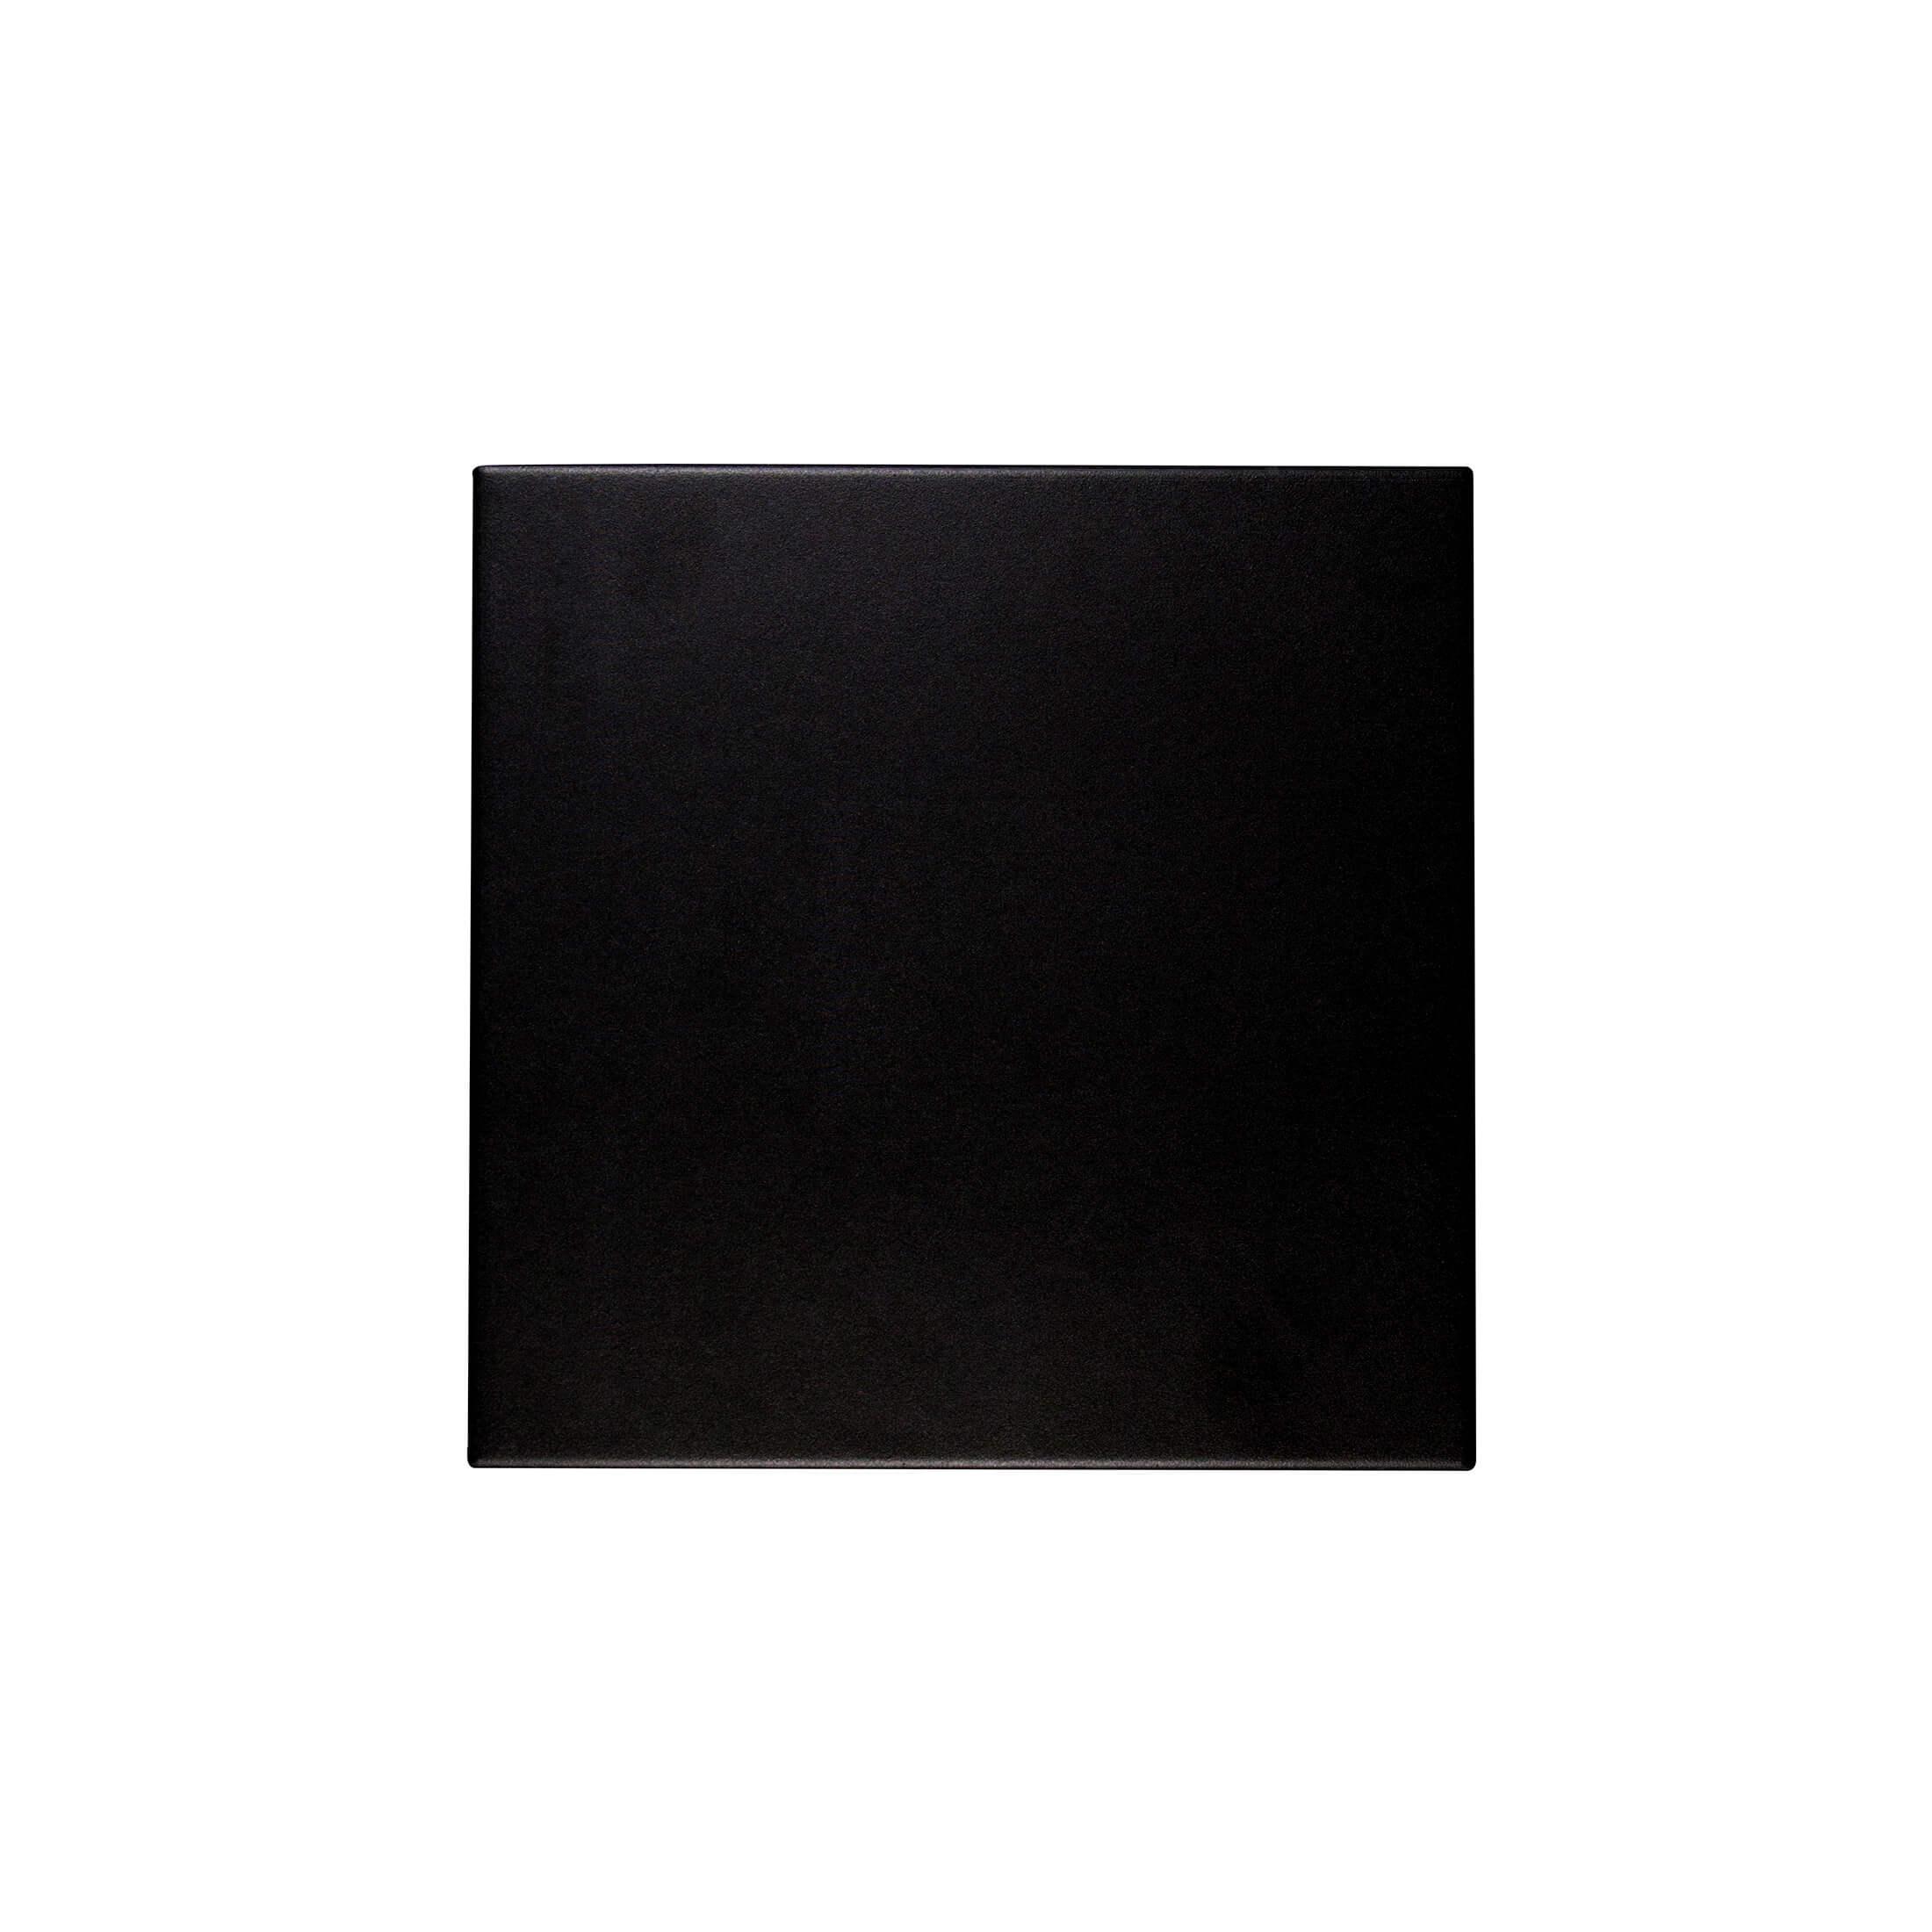 ADPV9026 - PAVIMENTO BLACK - 18.5 cm X 18.5 cm